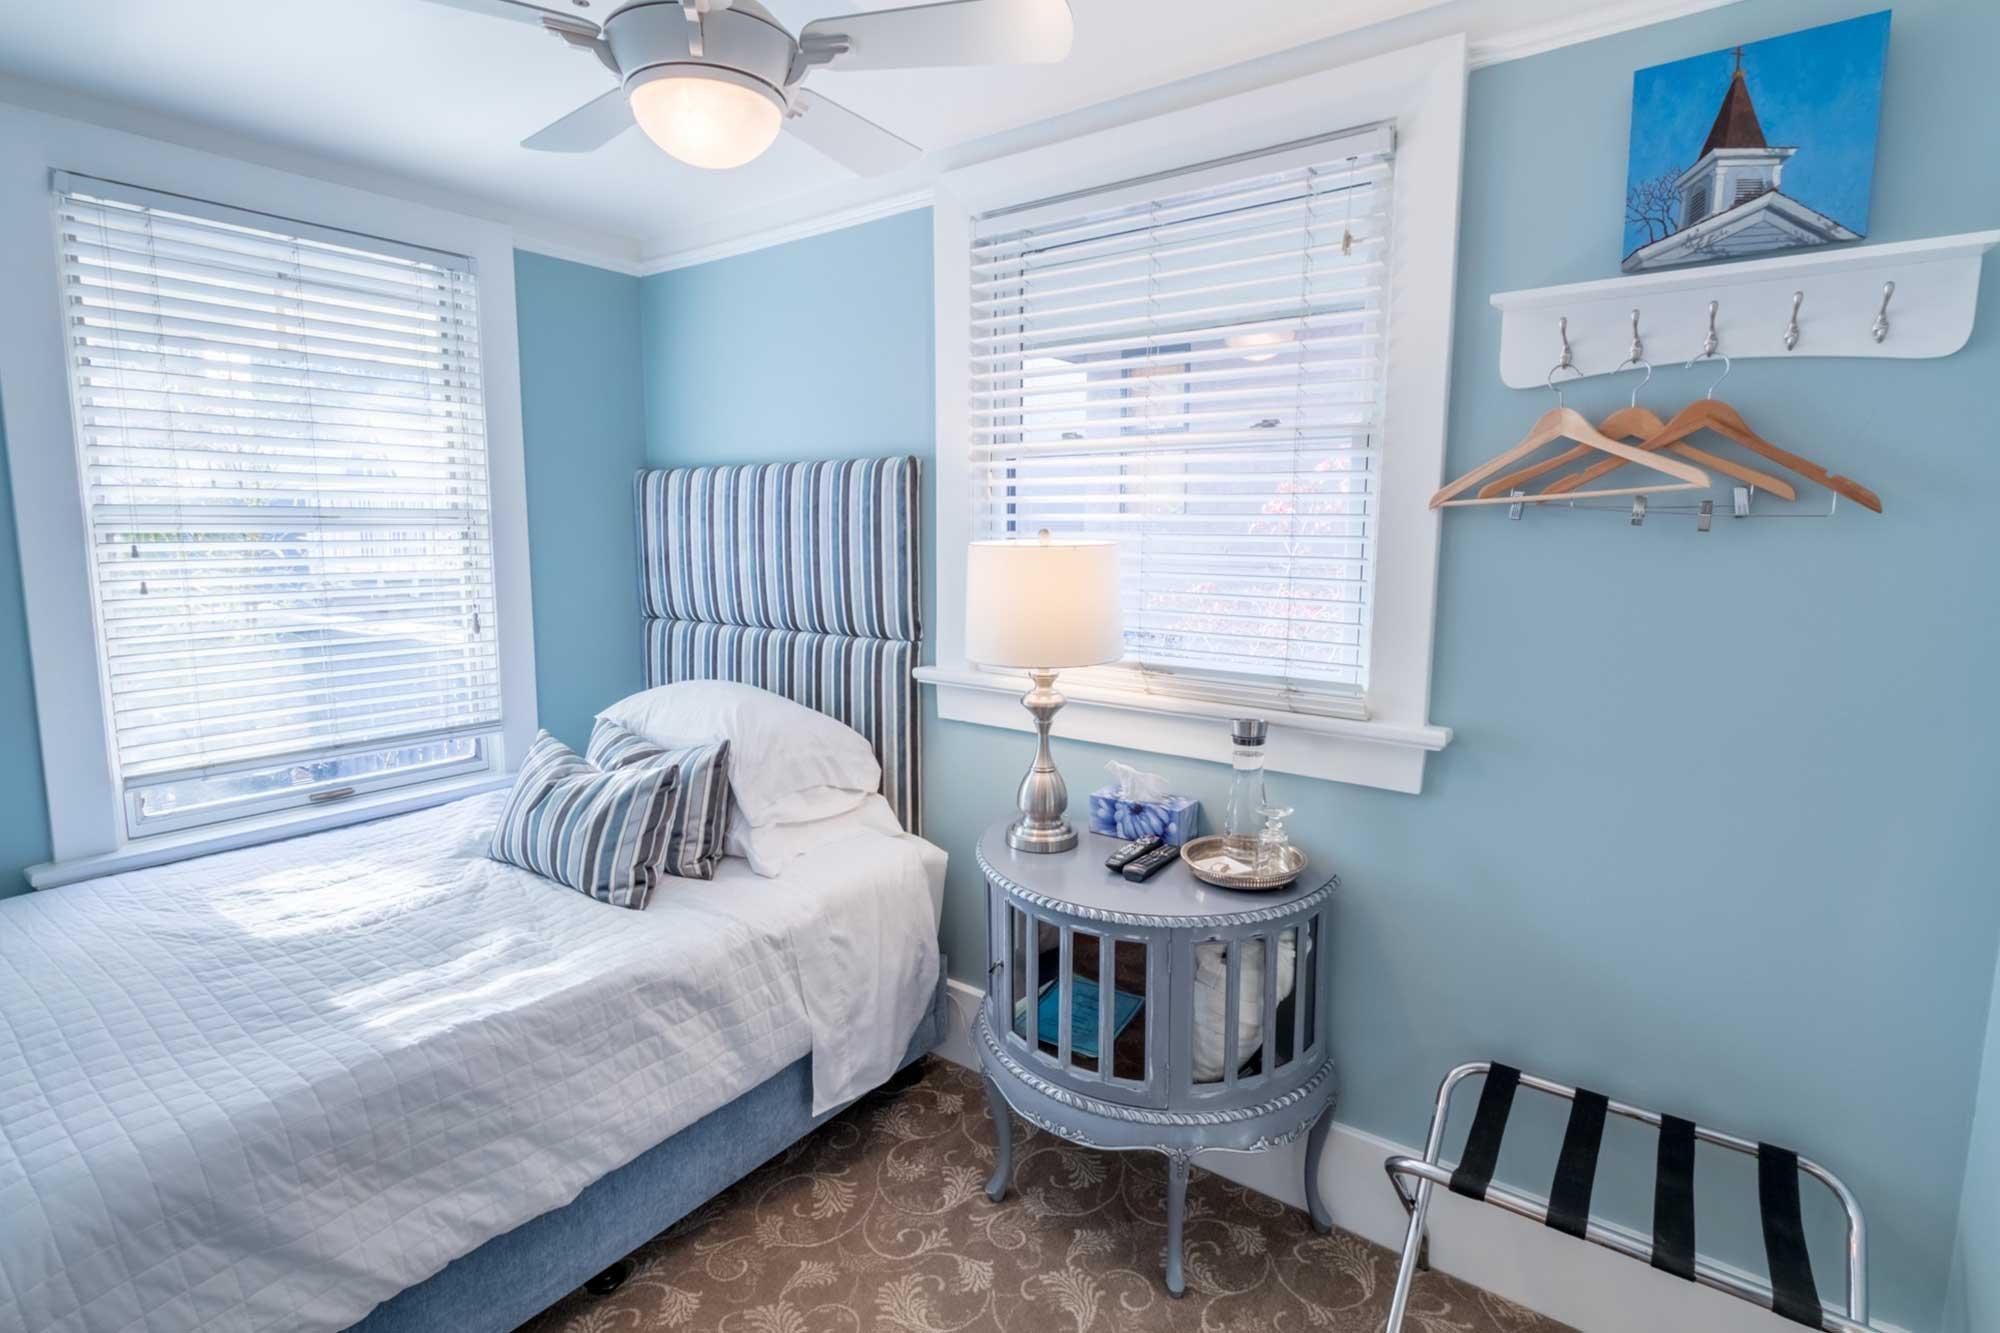 blue-themed bedroom